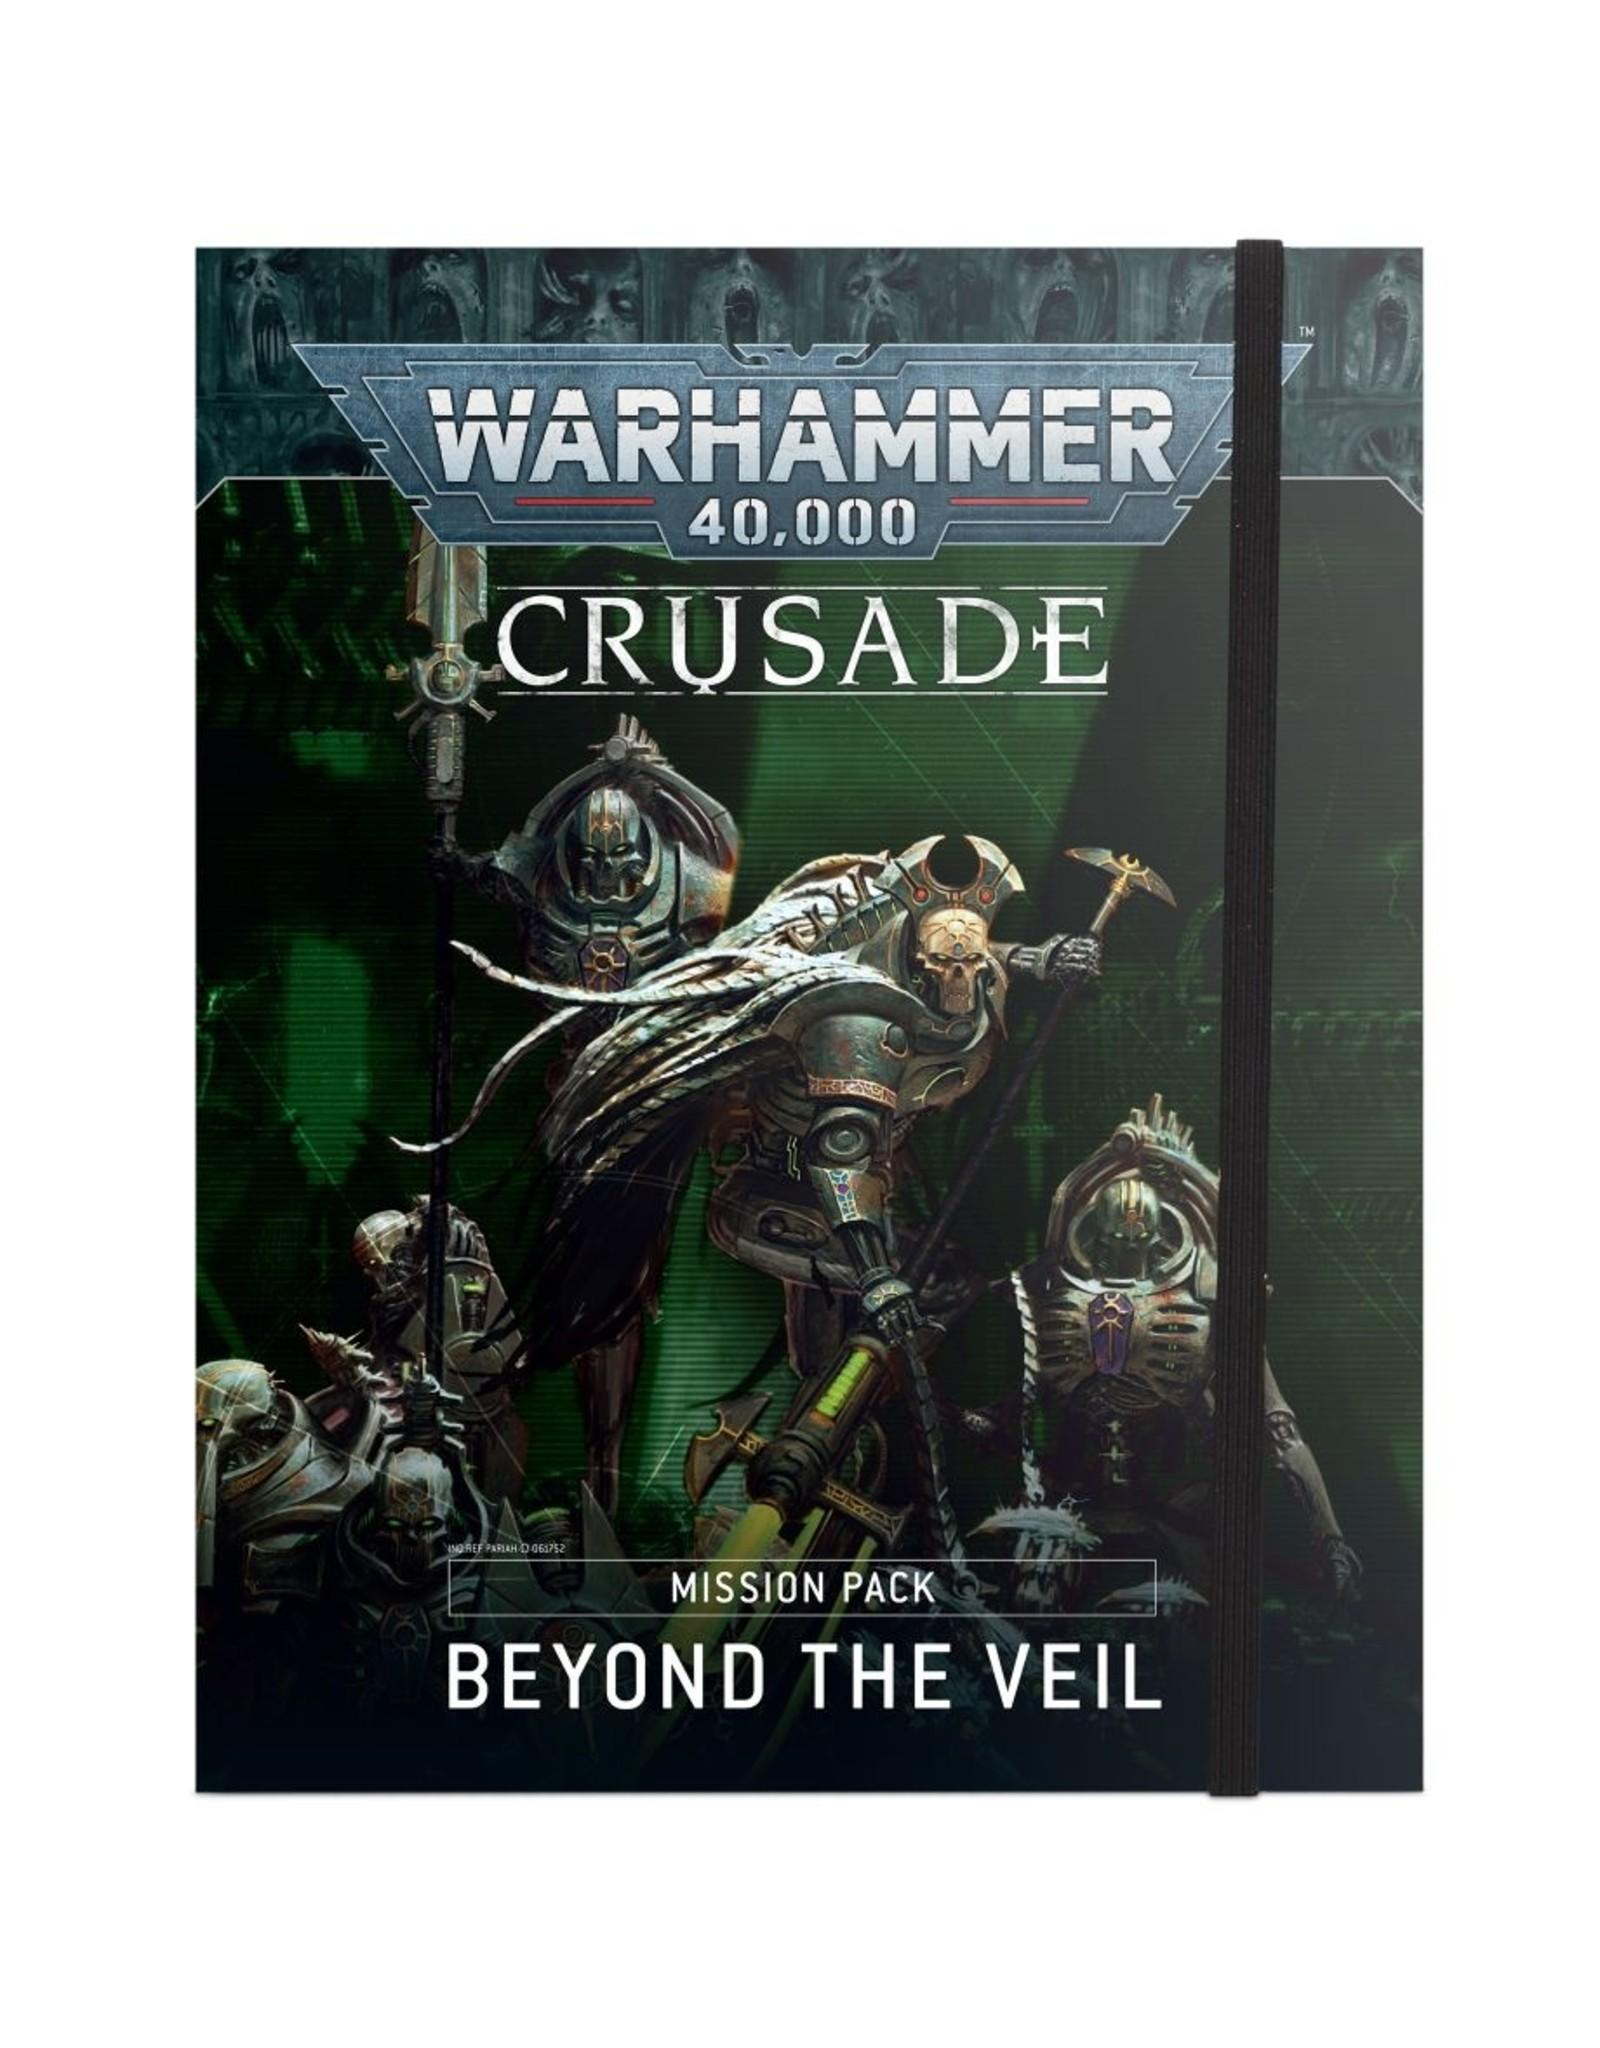 Games Workshop Warhammer 40,000 Crusade - Beyond the Veil